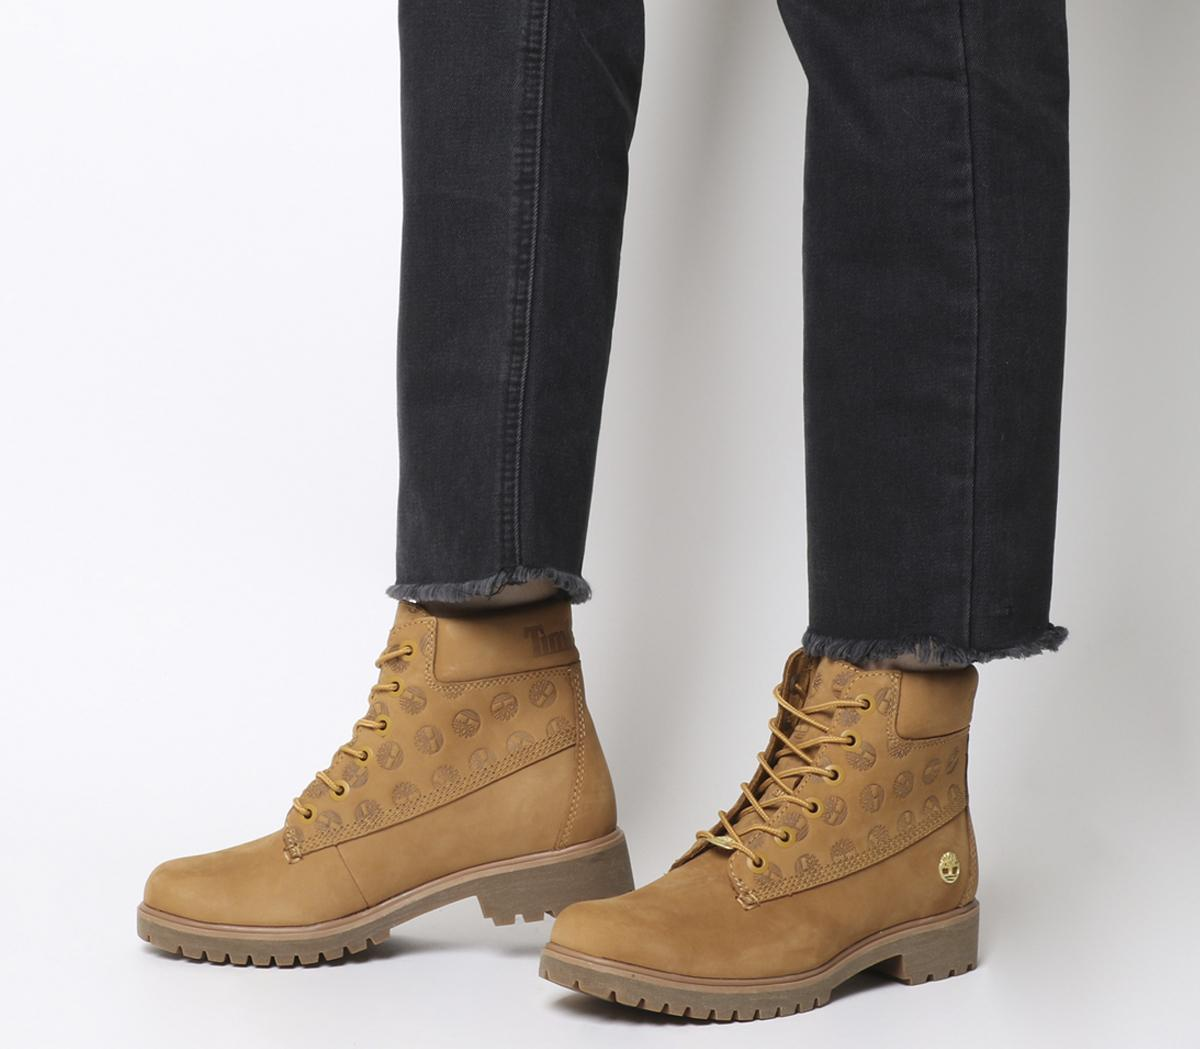 Timberland Slim Nellie Chukka Boots Wheat Nubuck Ankle Boots